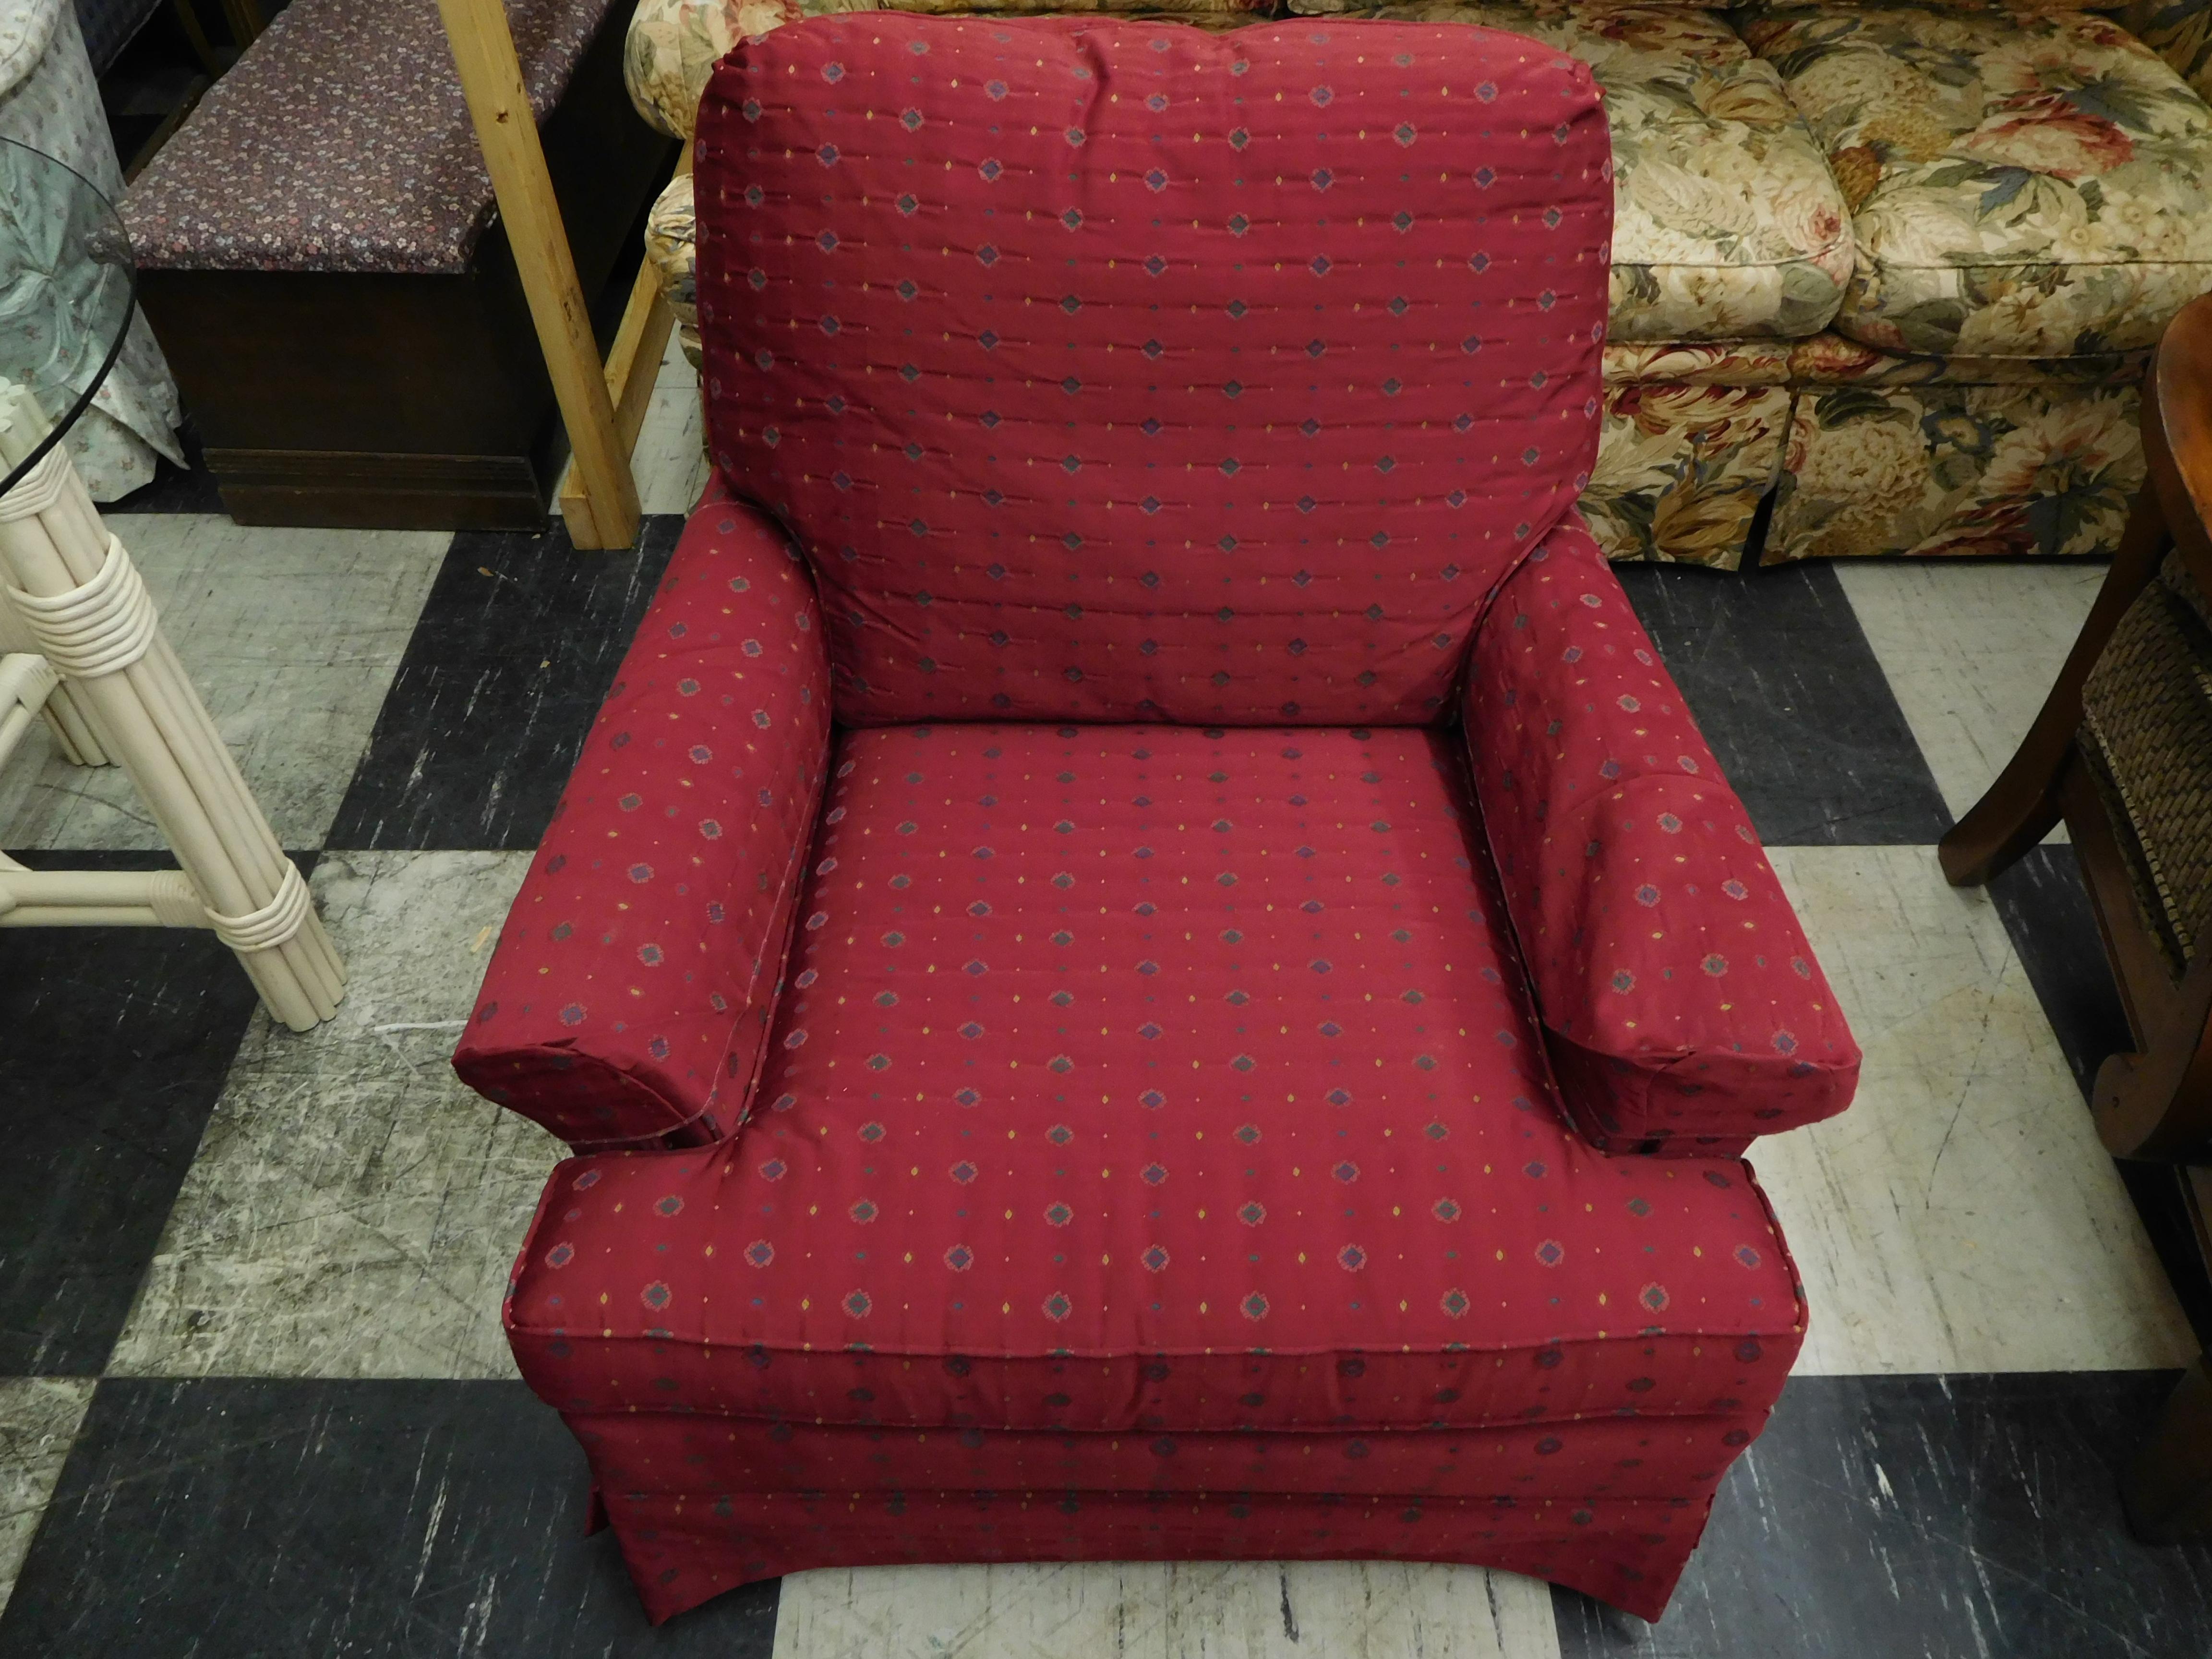 Raspberry Upholstered Chair